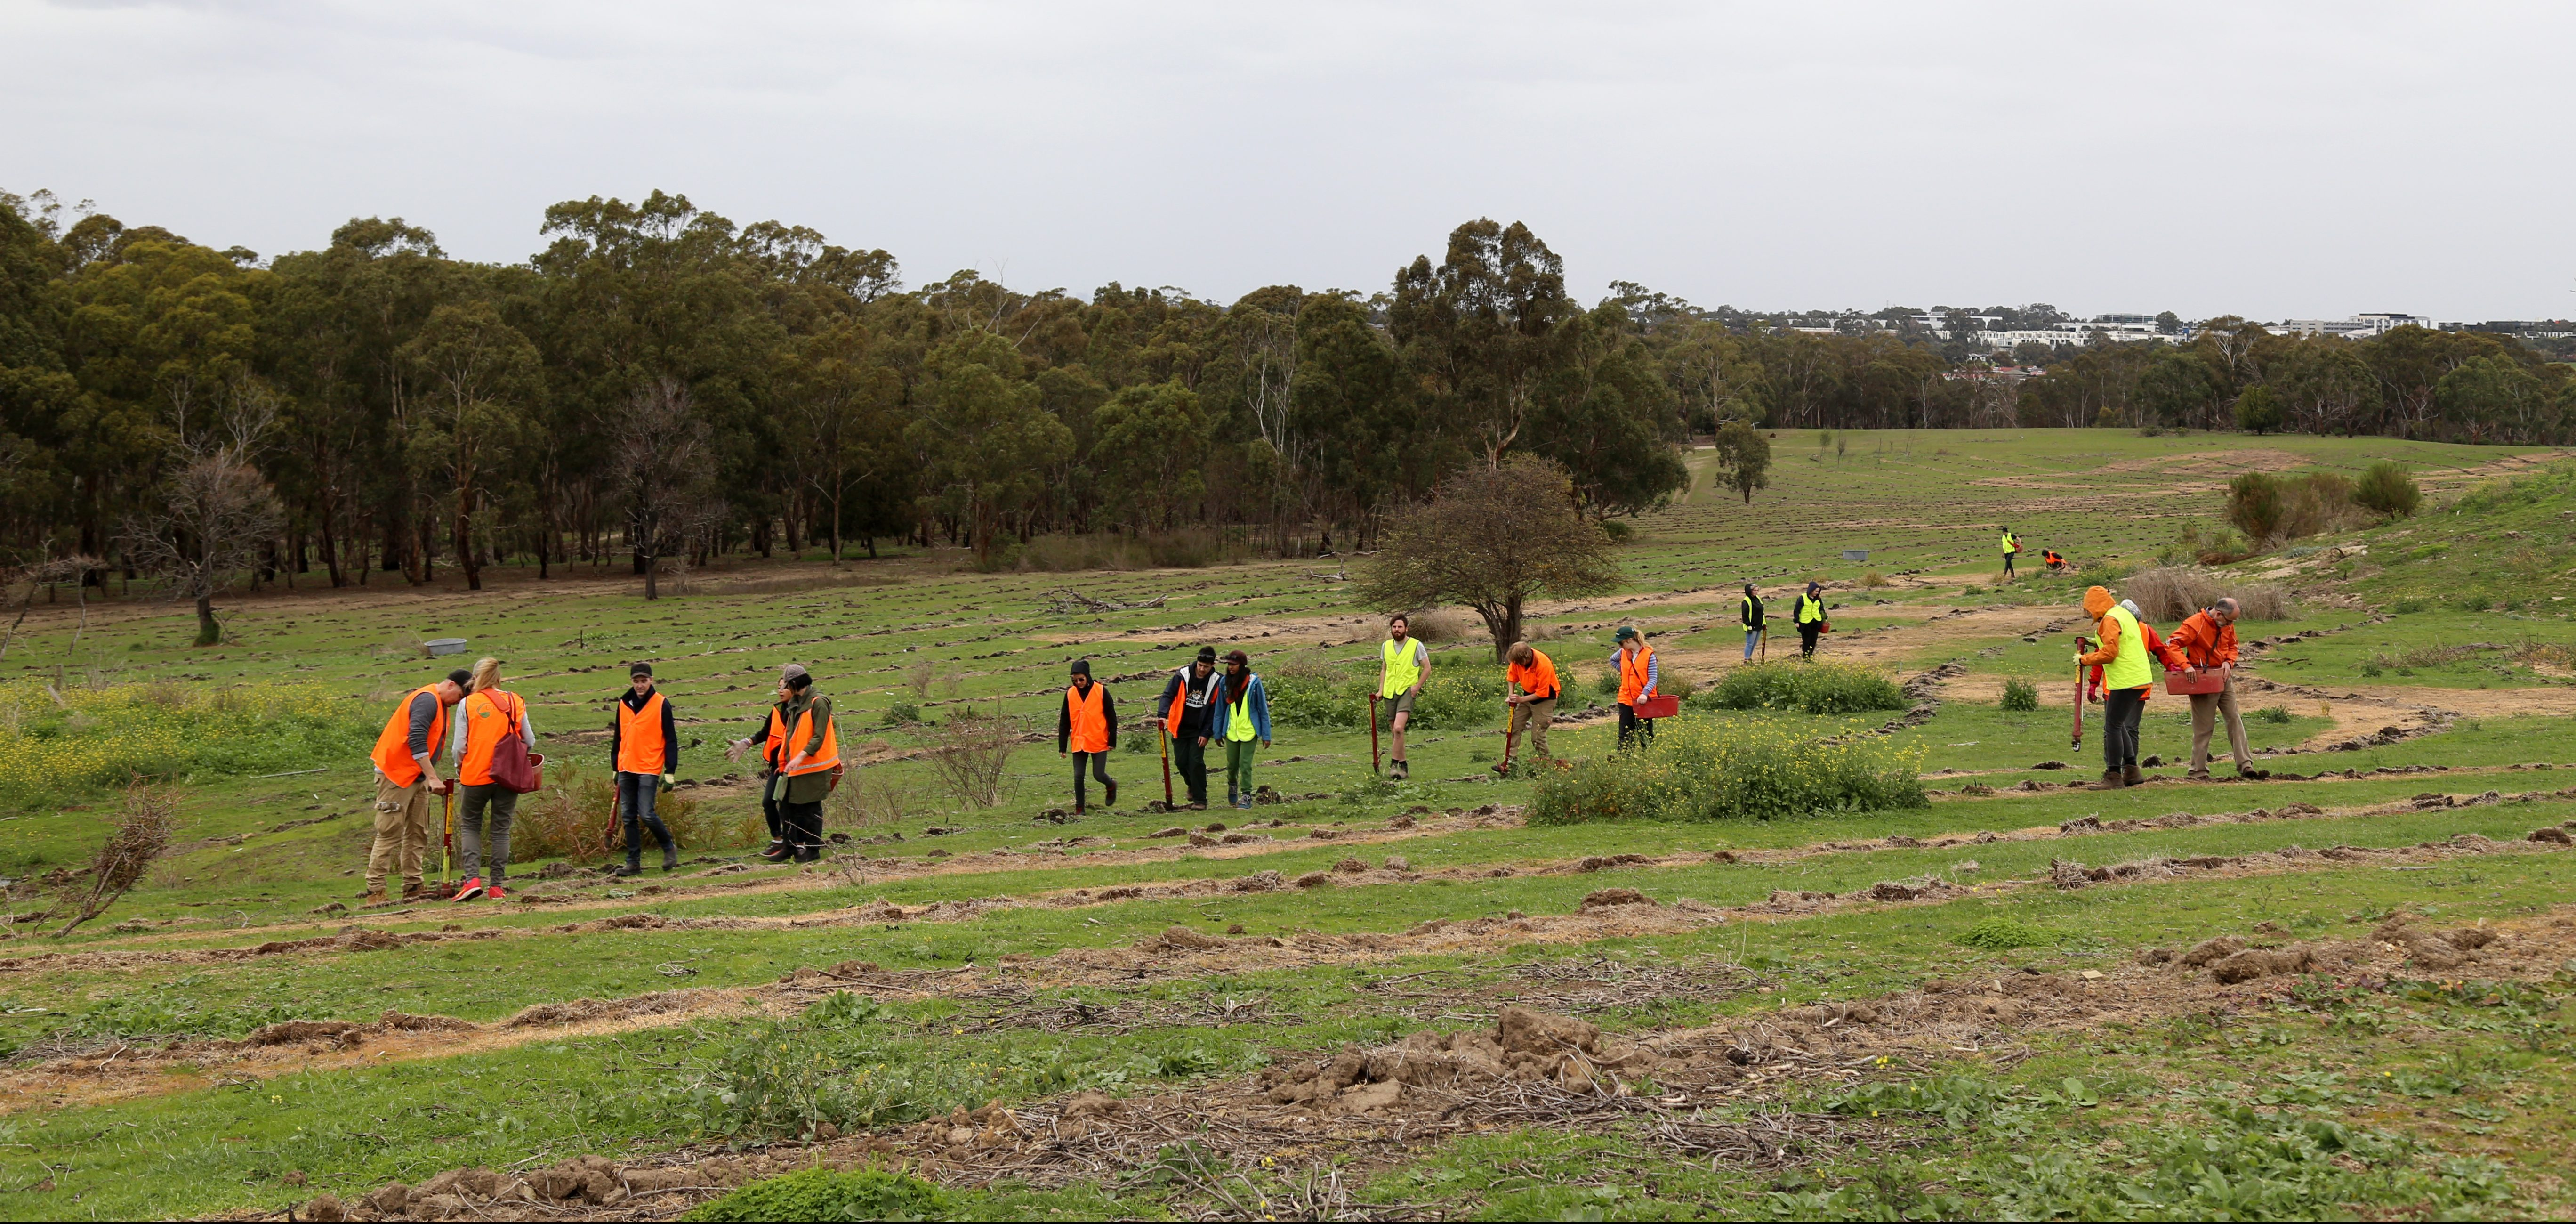 Image of some people in orange hi-vis vests planting trees